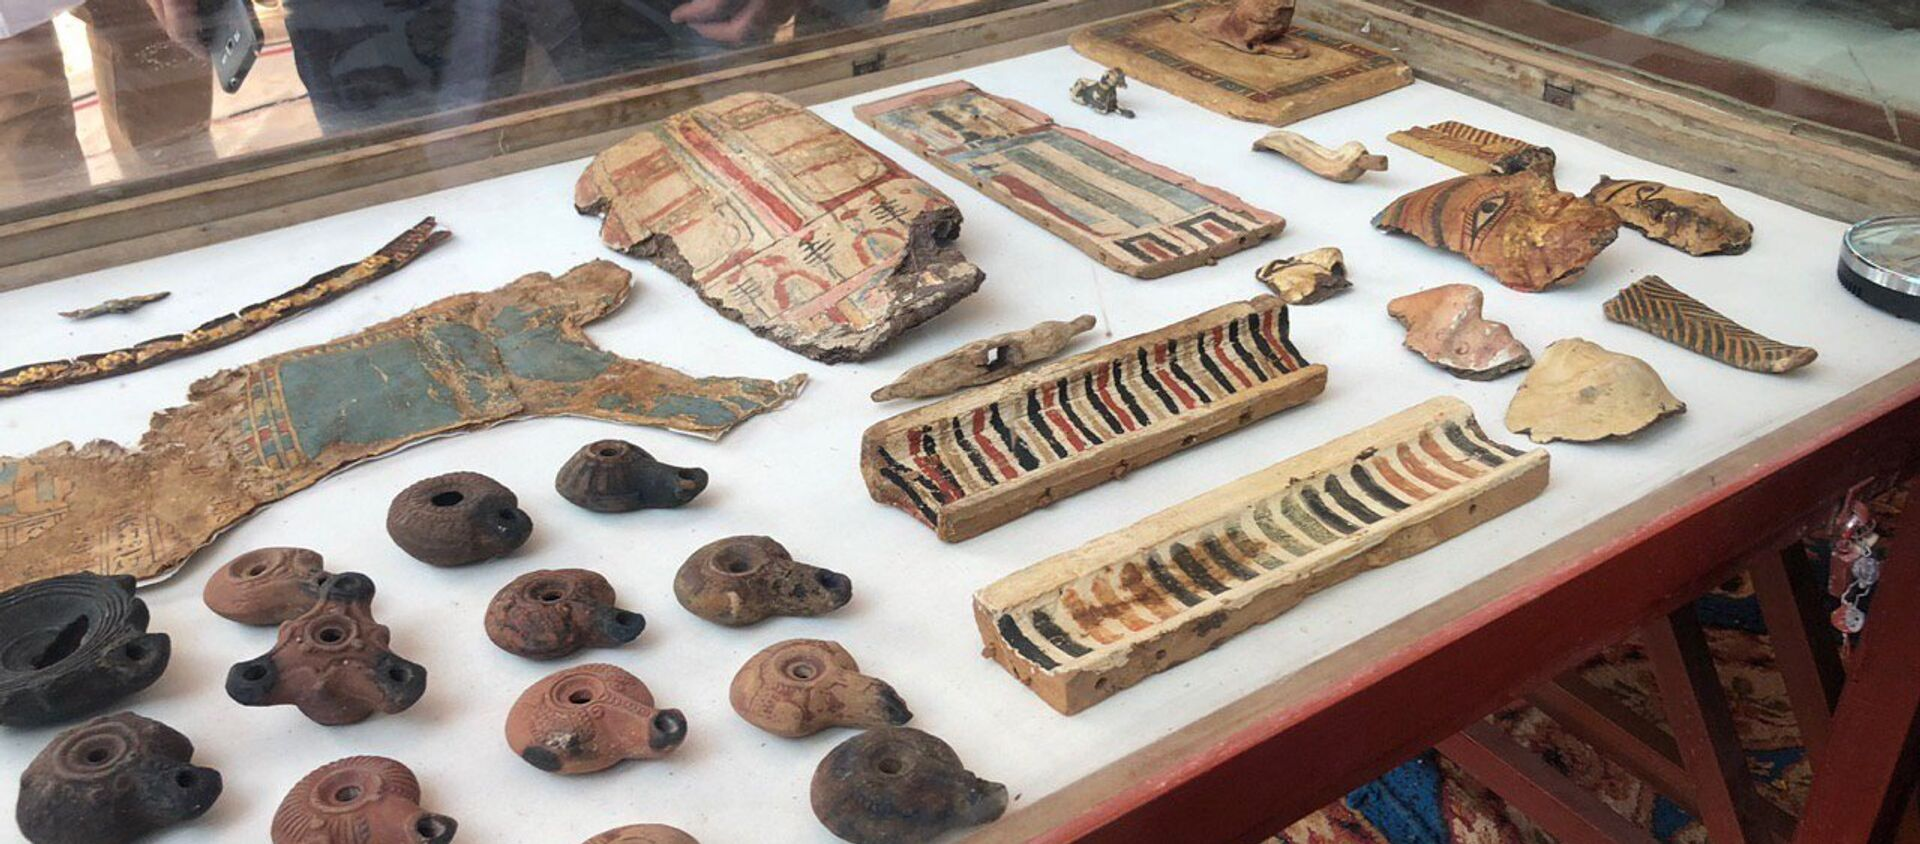 Los hallazgos arqueológicos en una antigua tumba en Egipto (archivo) - Sputnik Mundo, 1920, 19.06.2019